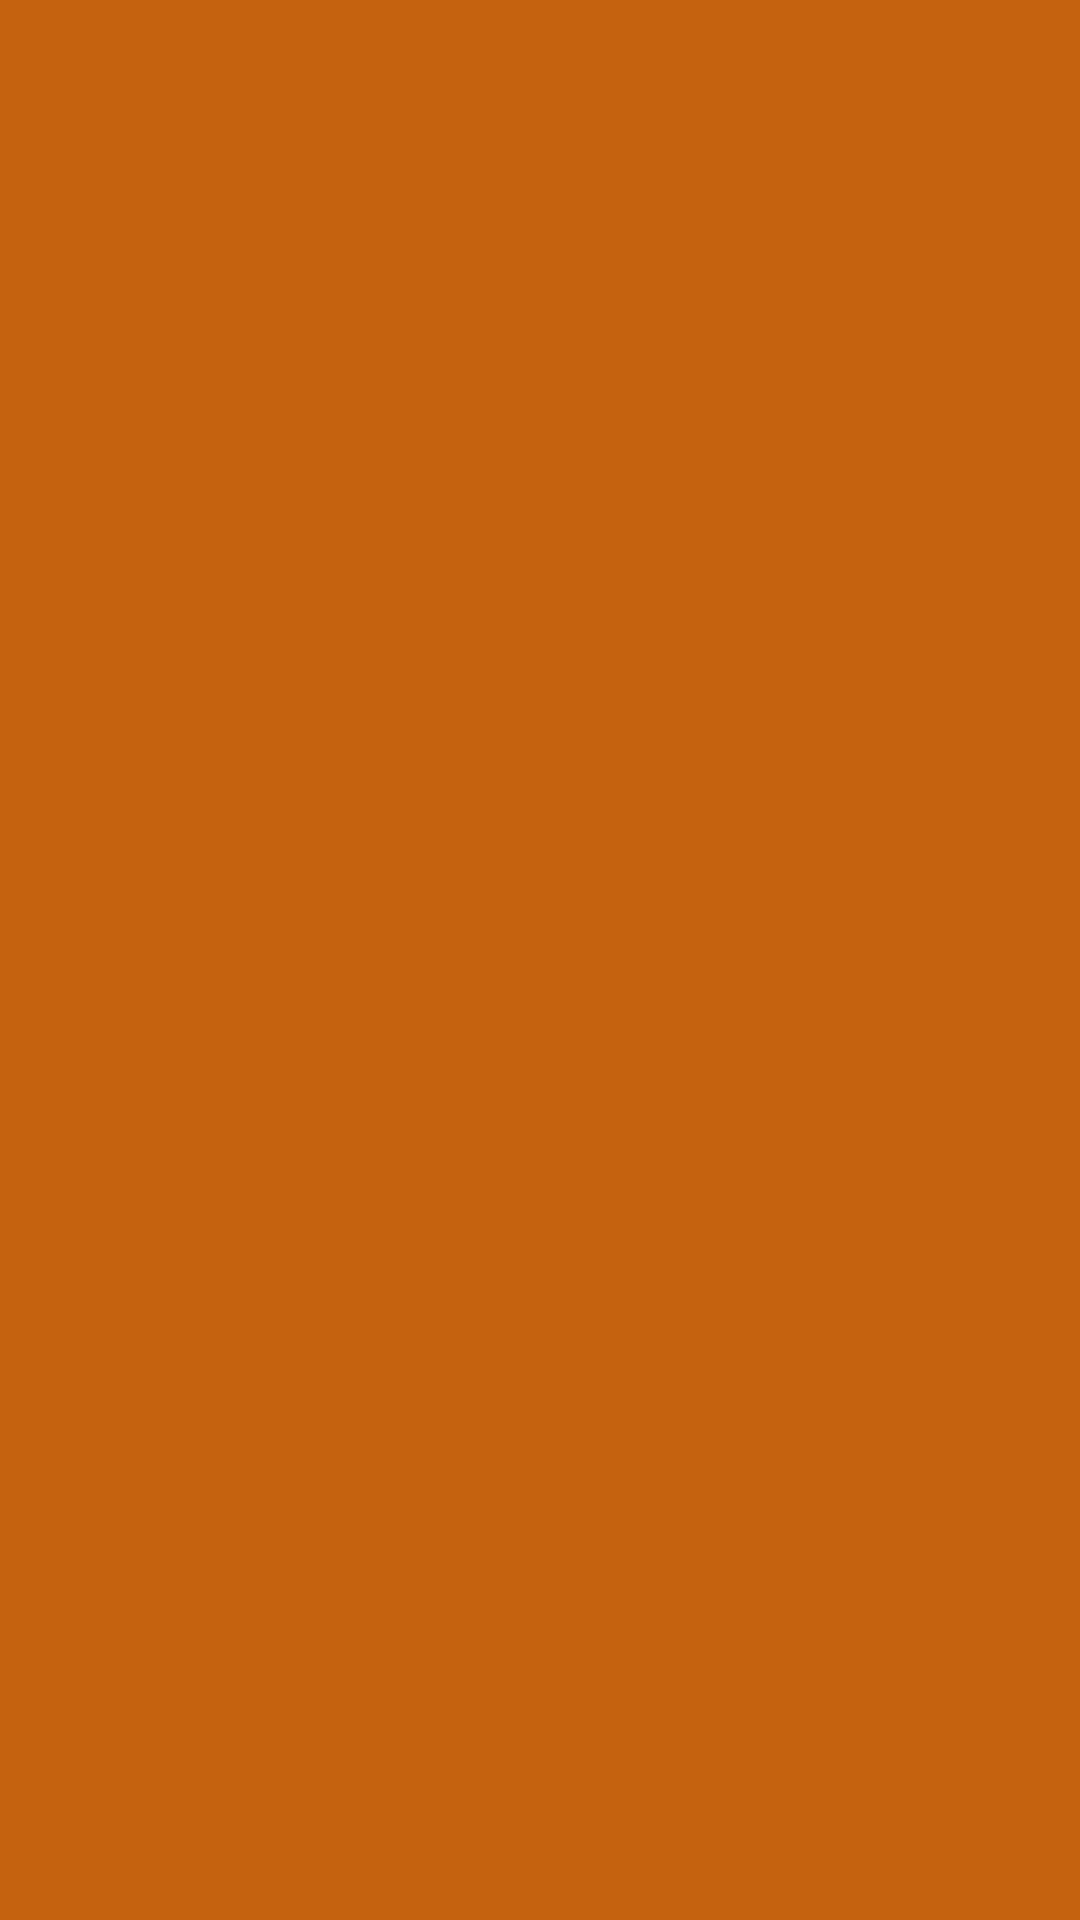 1080x1920 Alloy Orange Solid Color Background